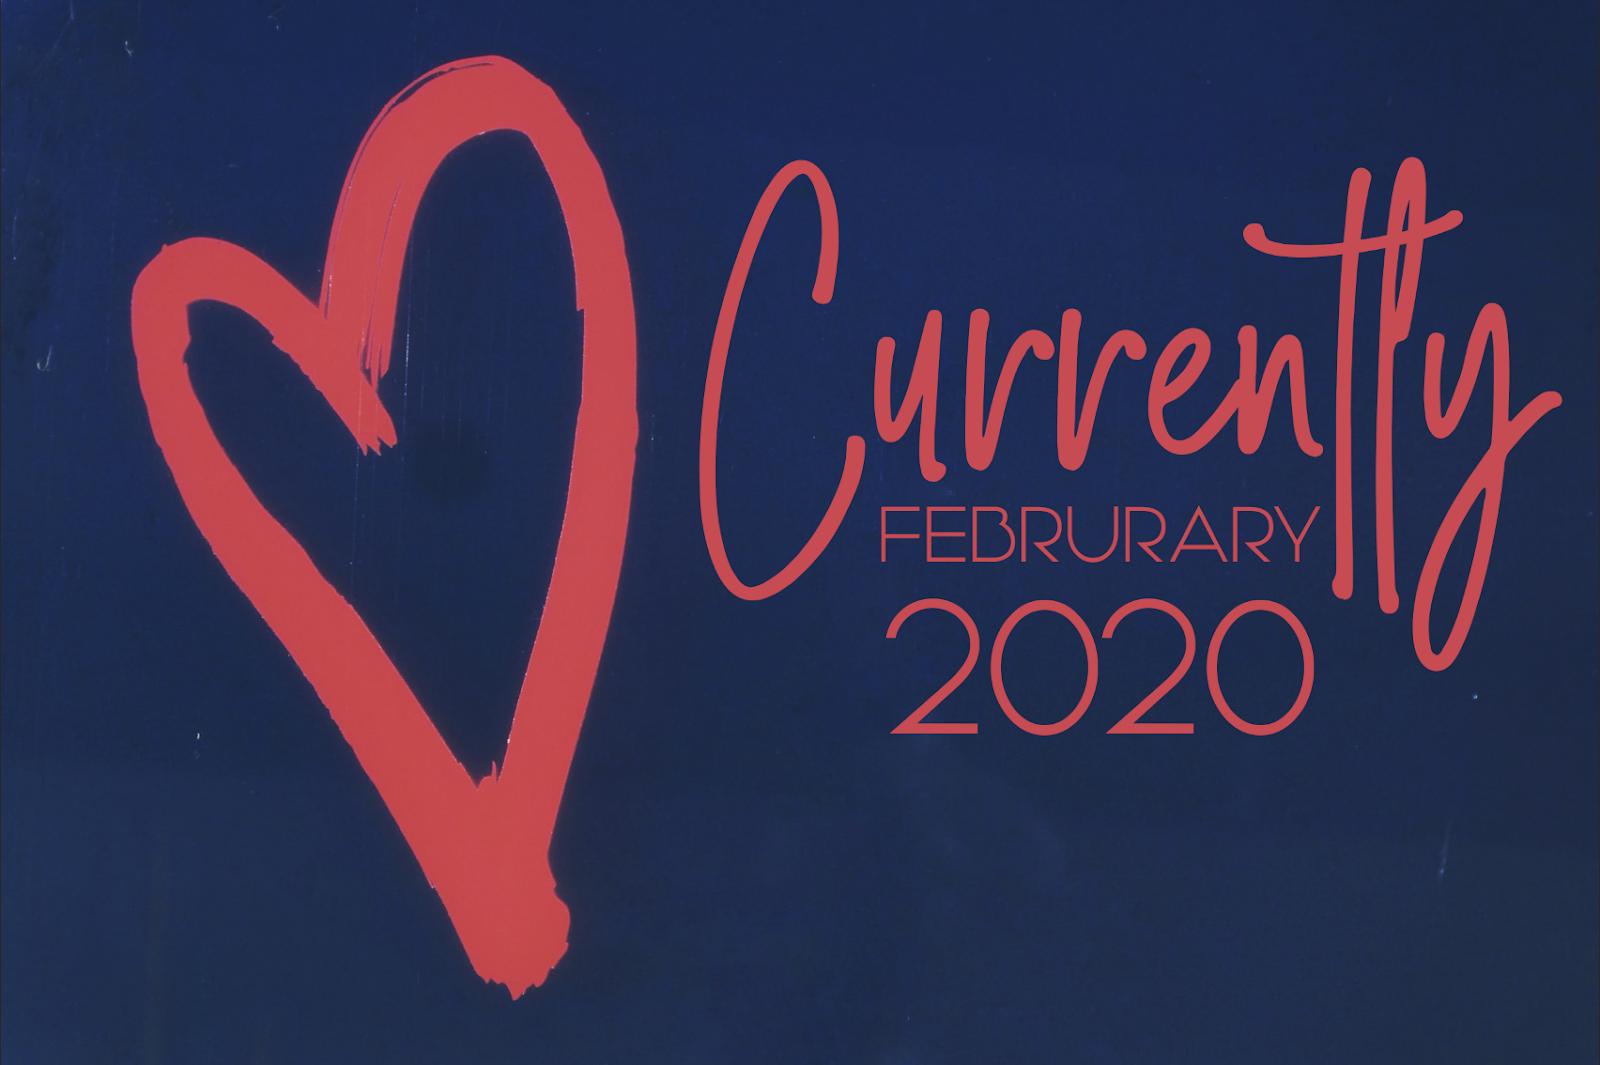 CURRENTLY | FEBRUARY 2020